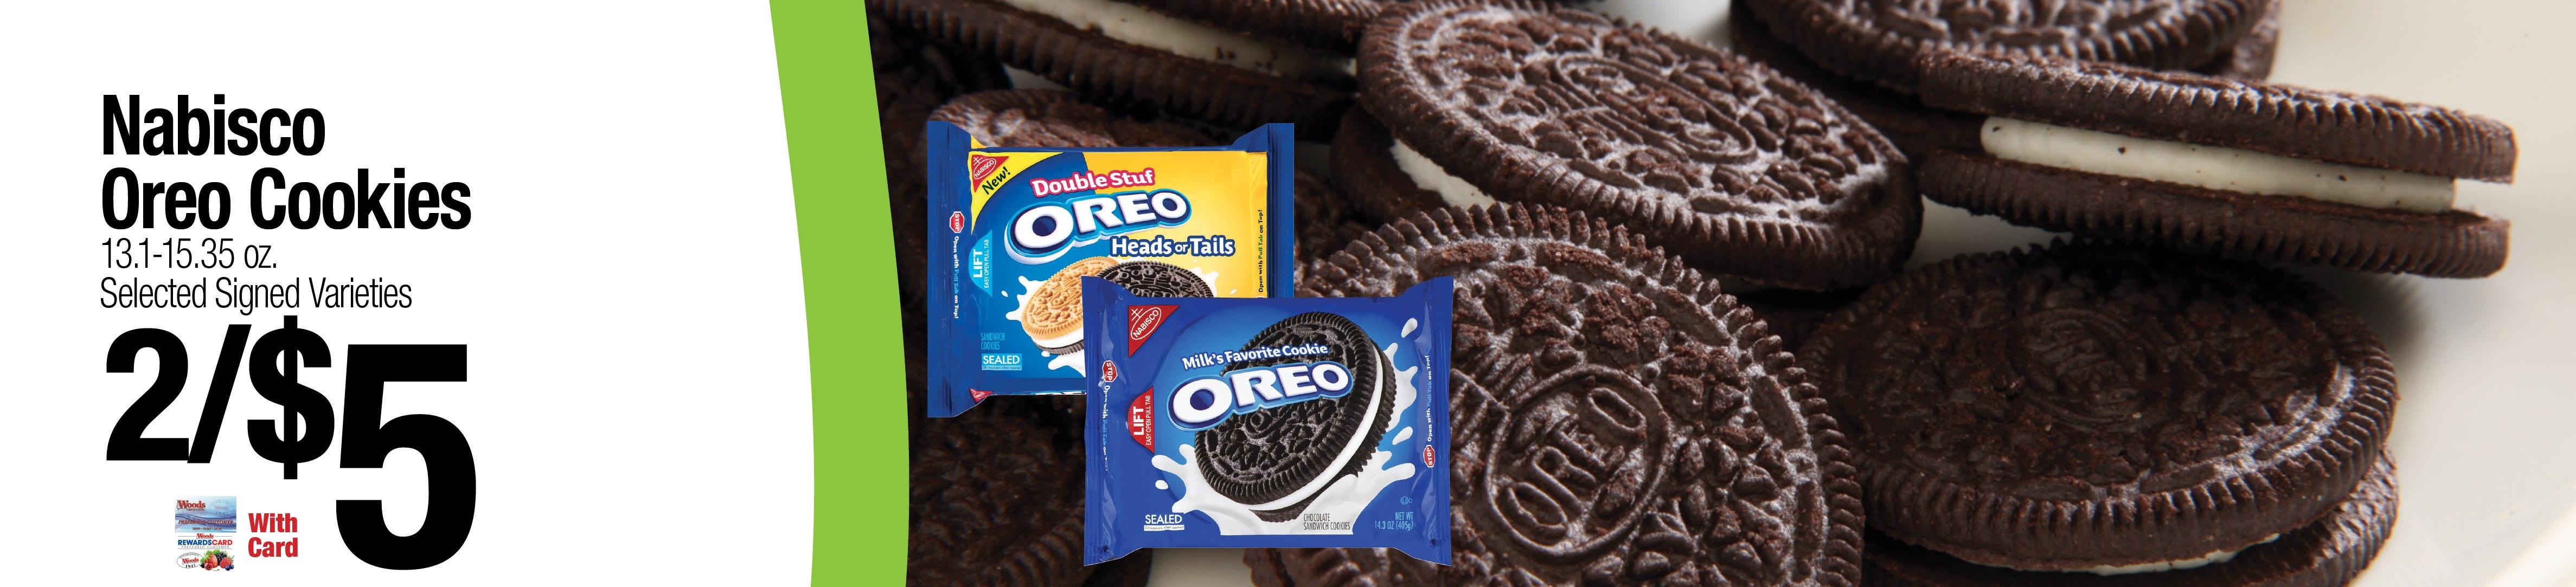 Nabisco Oreo Cookies 2/$5